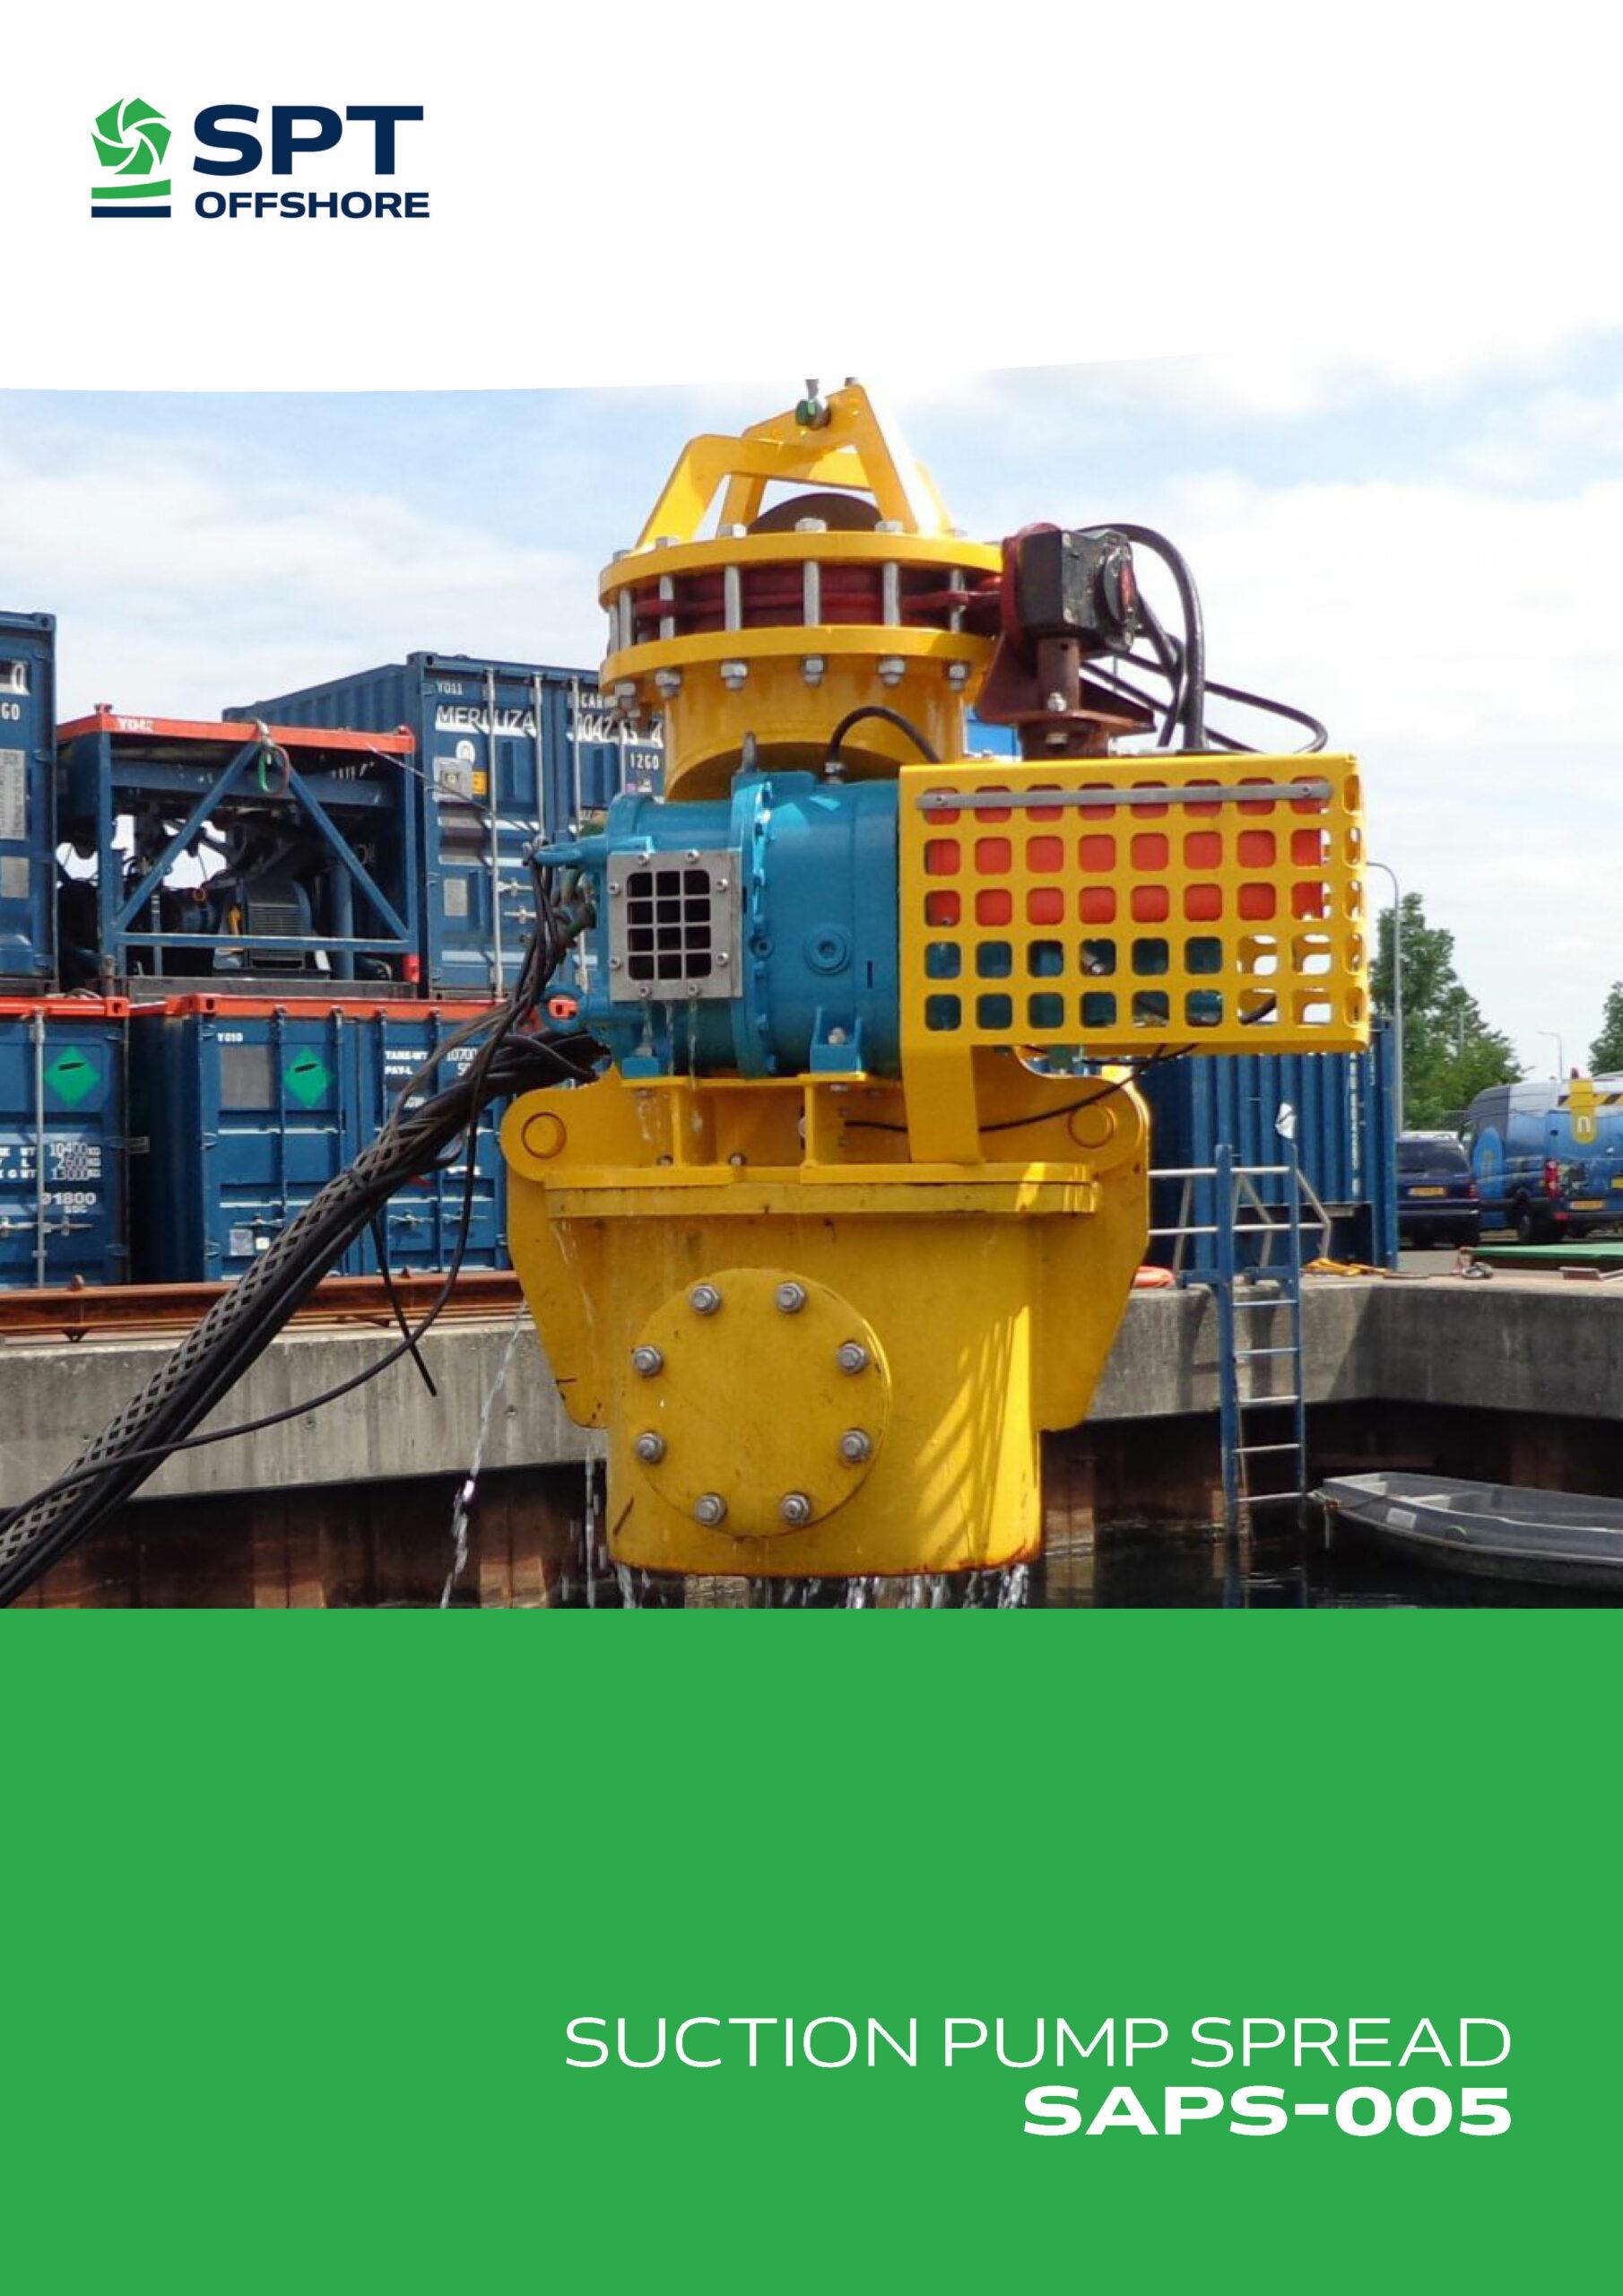 SPT 06-2021-EN-Equipment SAPS-005